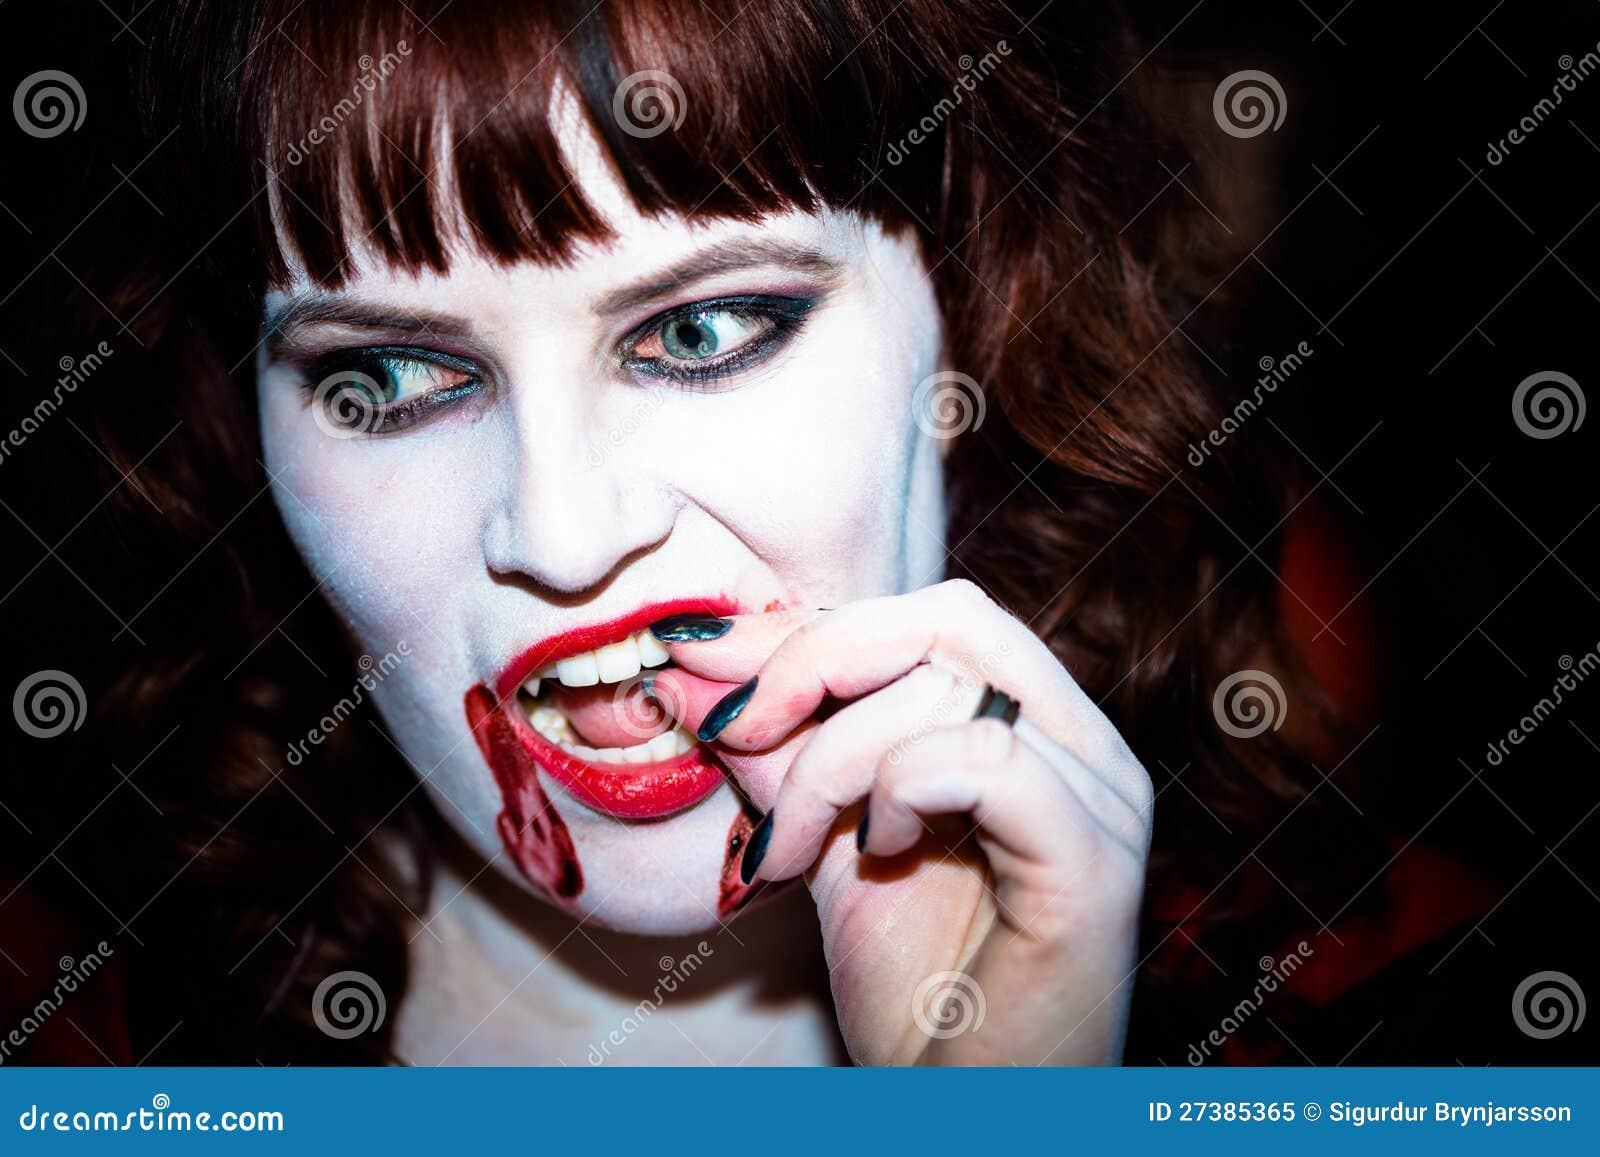 A Female Vampire Royalty Free Stock Photo Image 27385365